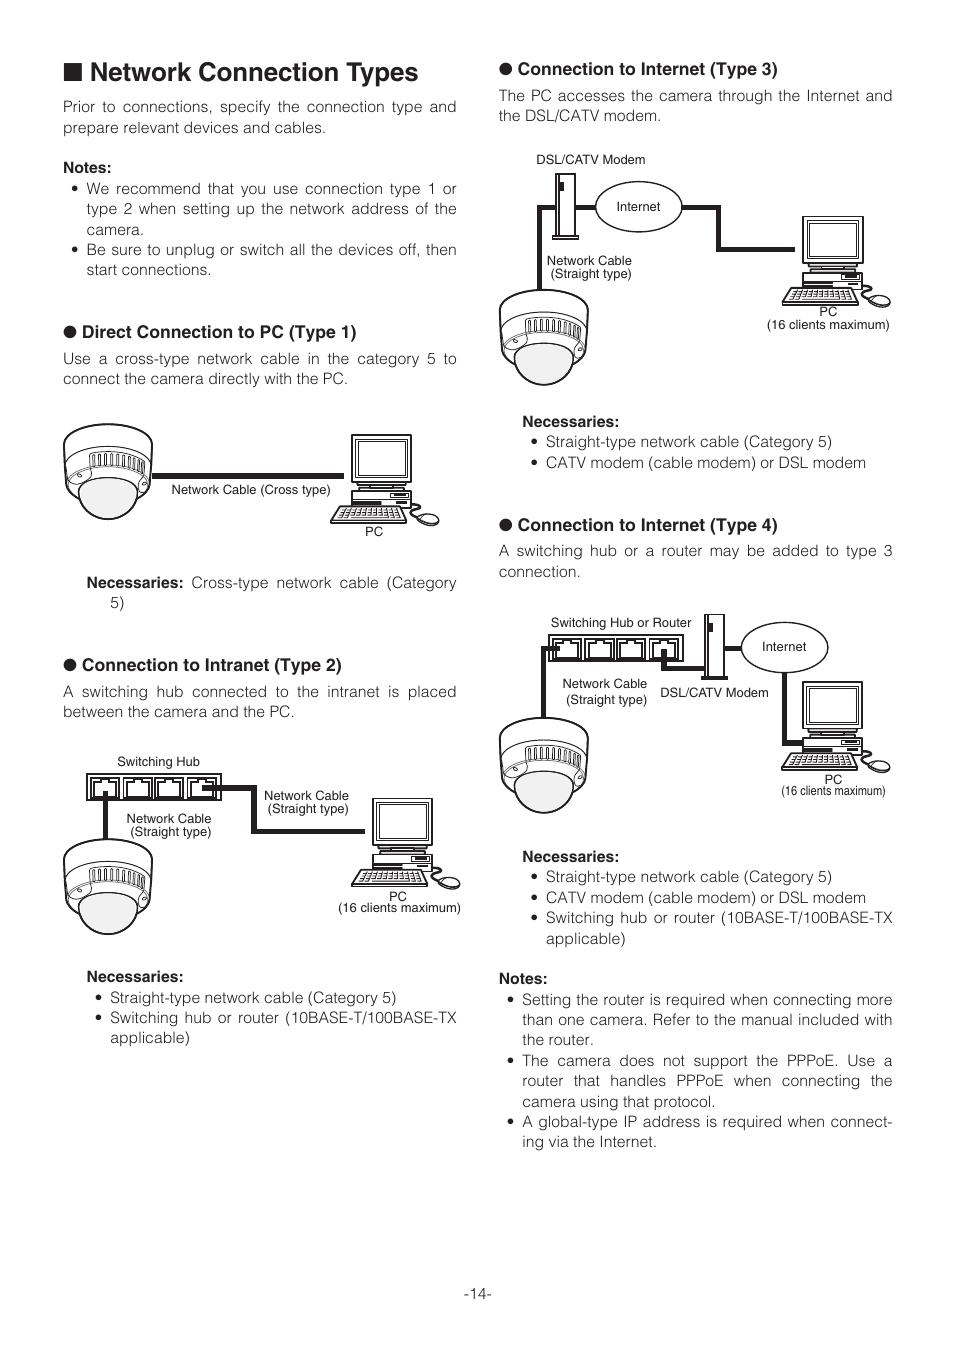 network connection types panasonic wv nw470s user manual page 14 rh manualsdir com Panasonic Viera Manual Panasonic.comsupportbycncompass